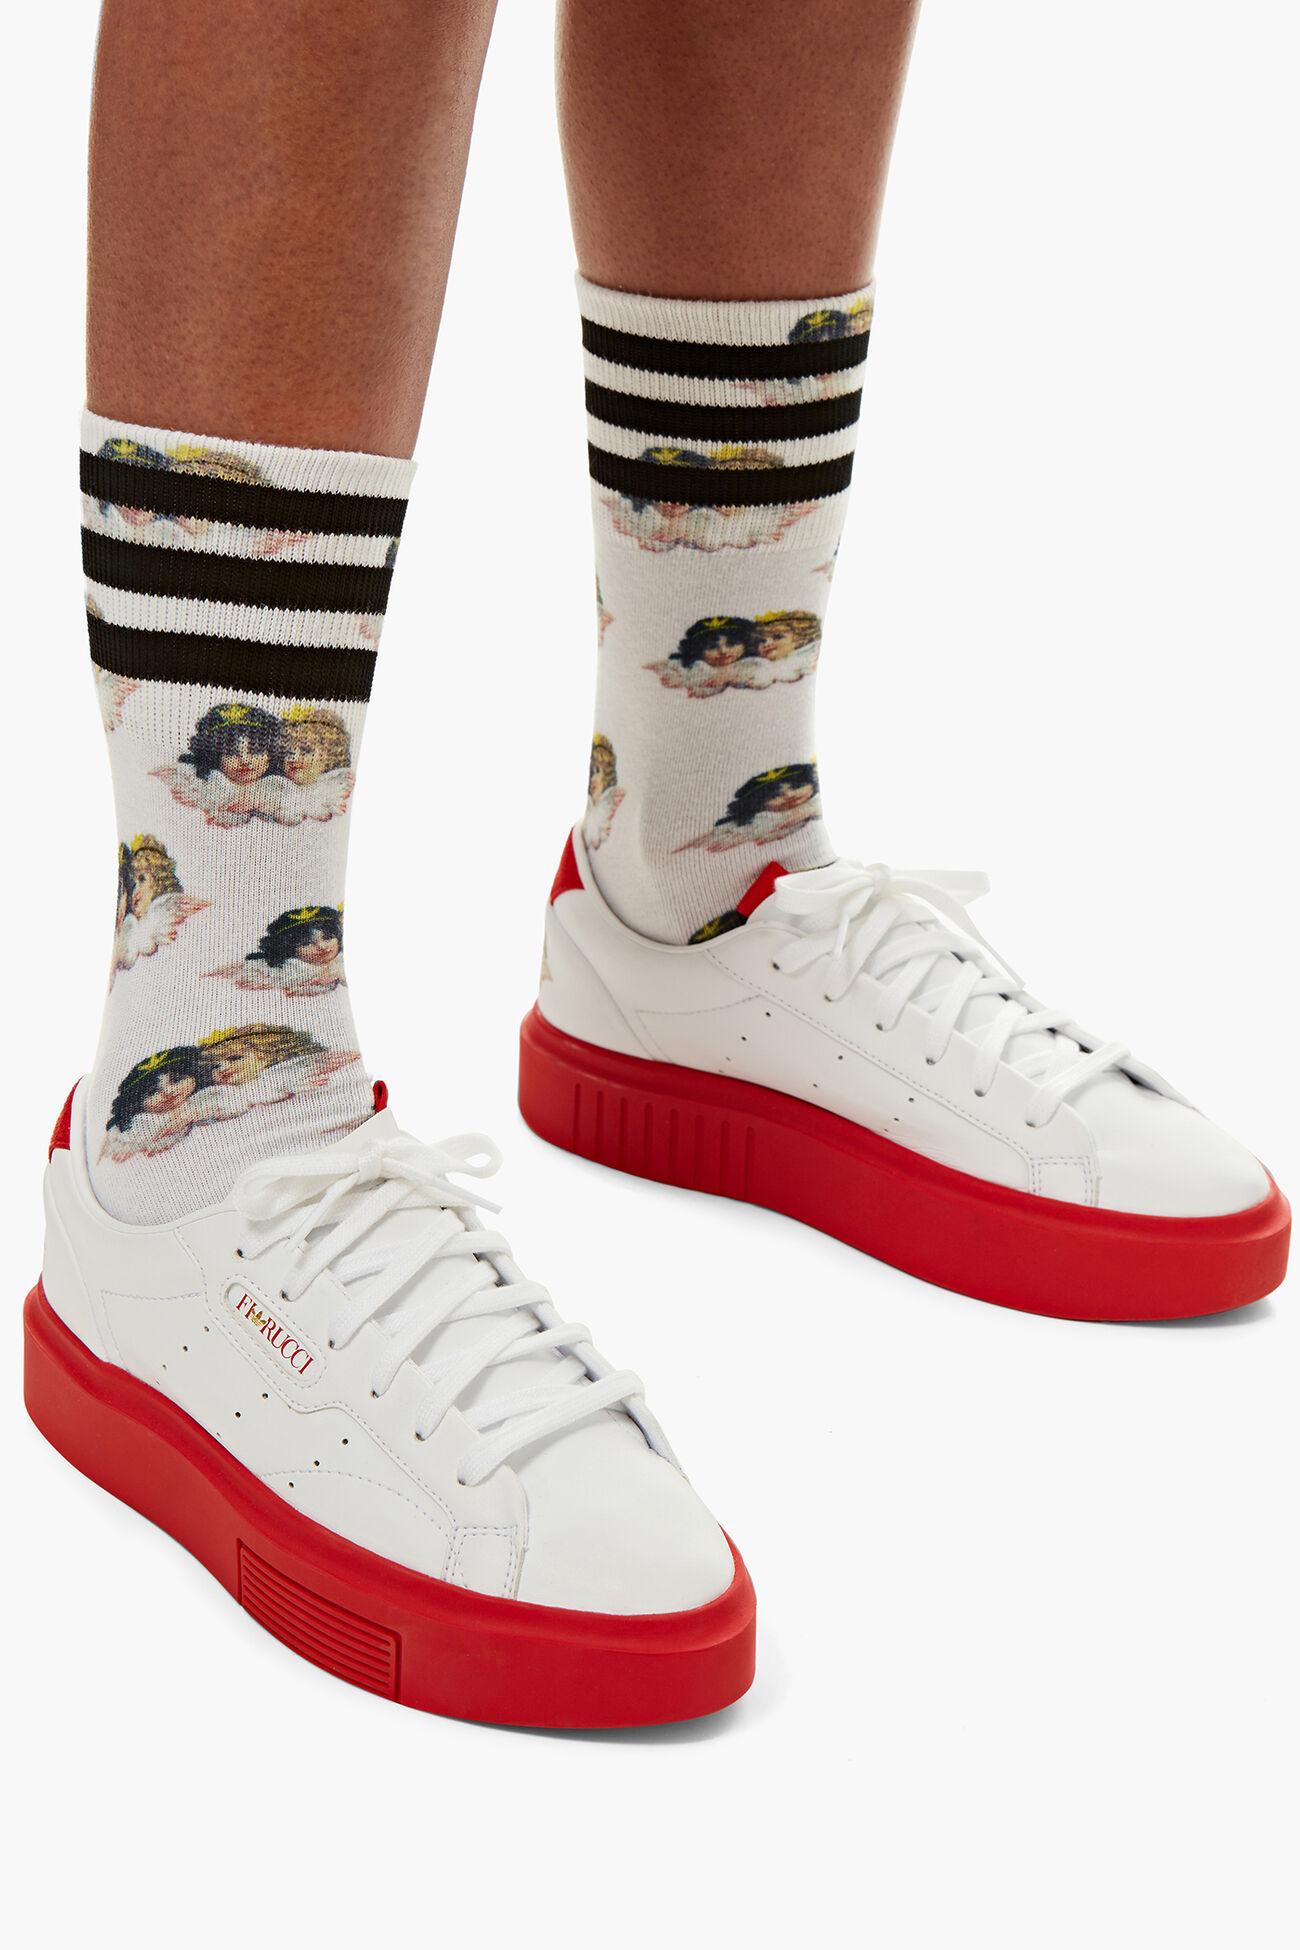 pas mal a75b3 58e35 Adidas x Fiorucci All Over Angel Socks White